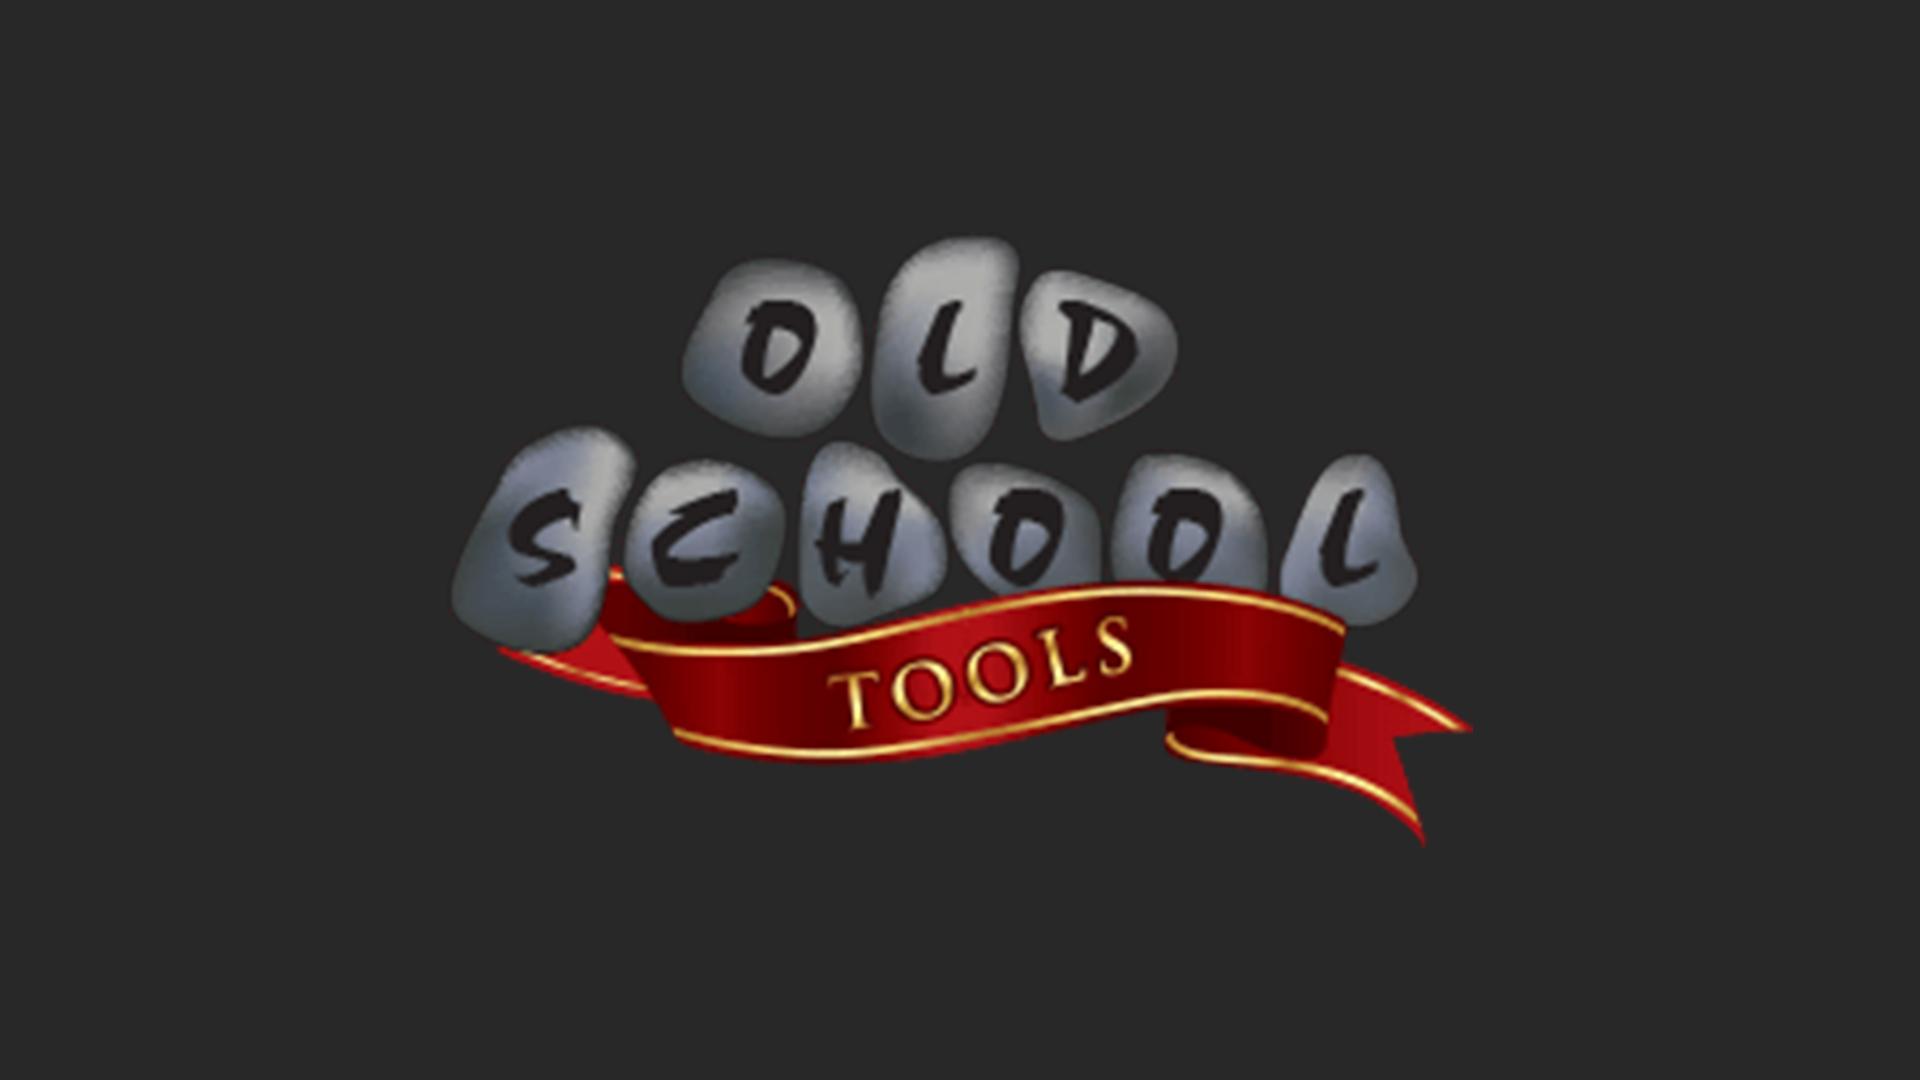 Old-School-Tools